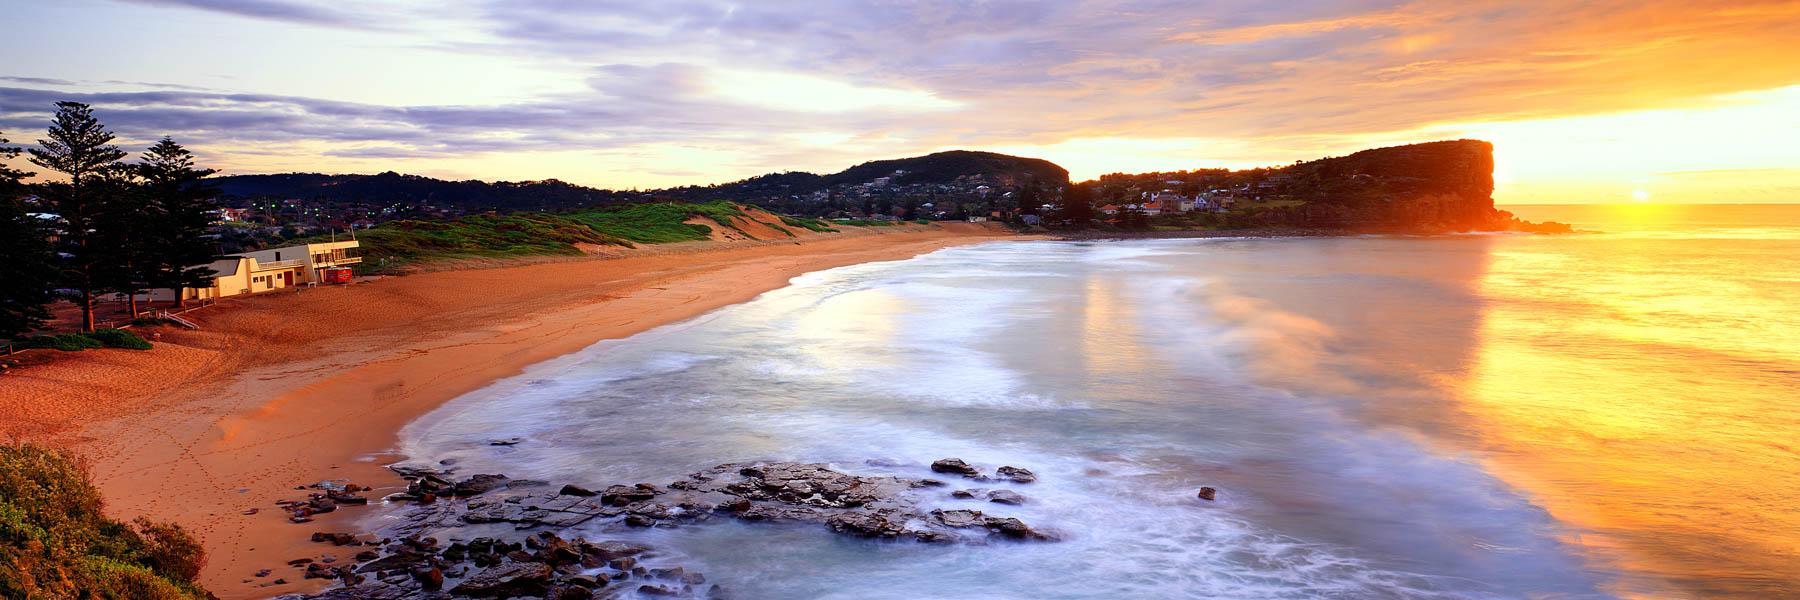 A golden sunrise over Avalon Beach, NSW, Australia.